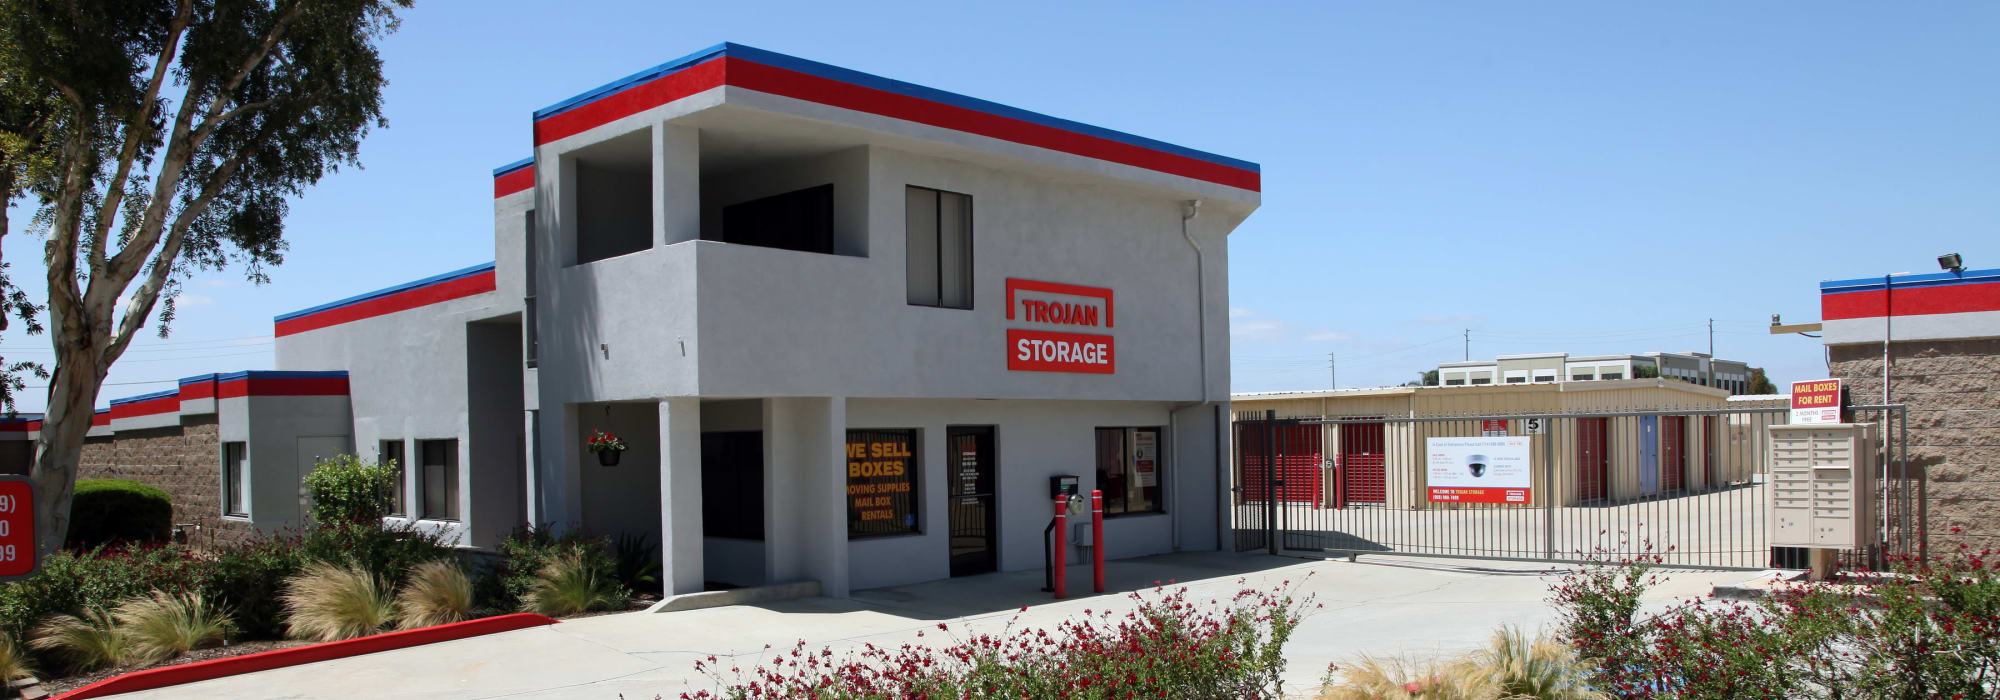 Self storage at Trojan Storage in Rancho Cucamonga California